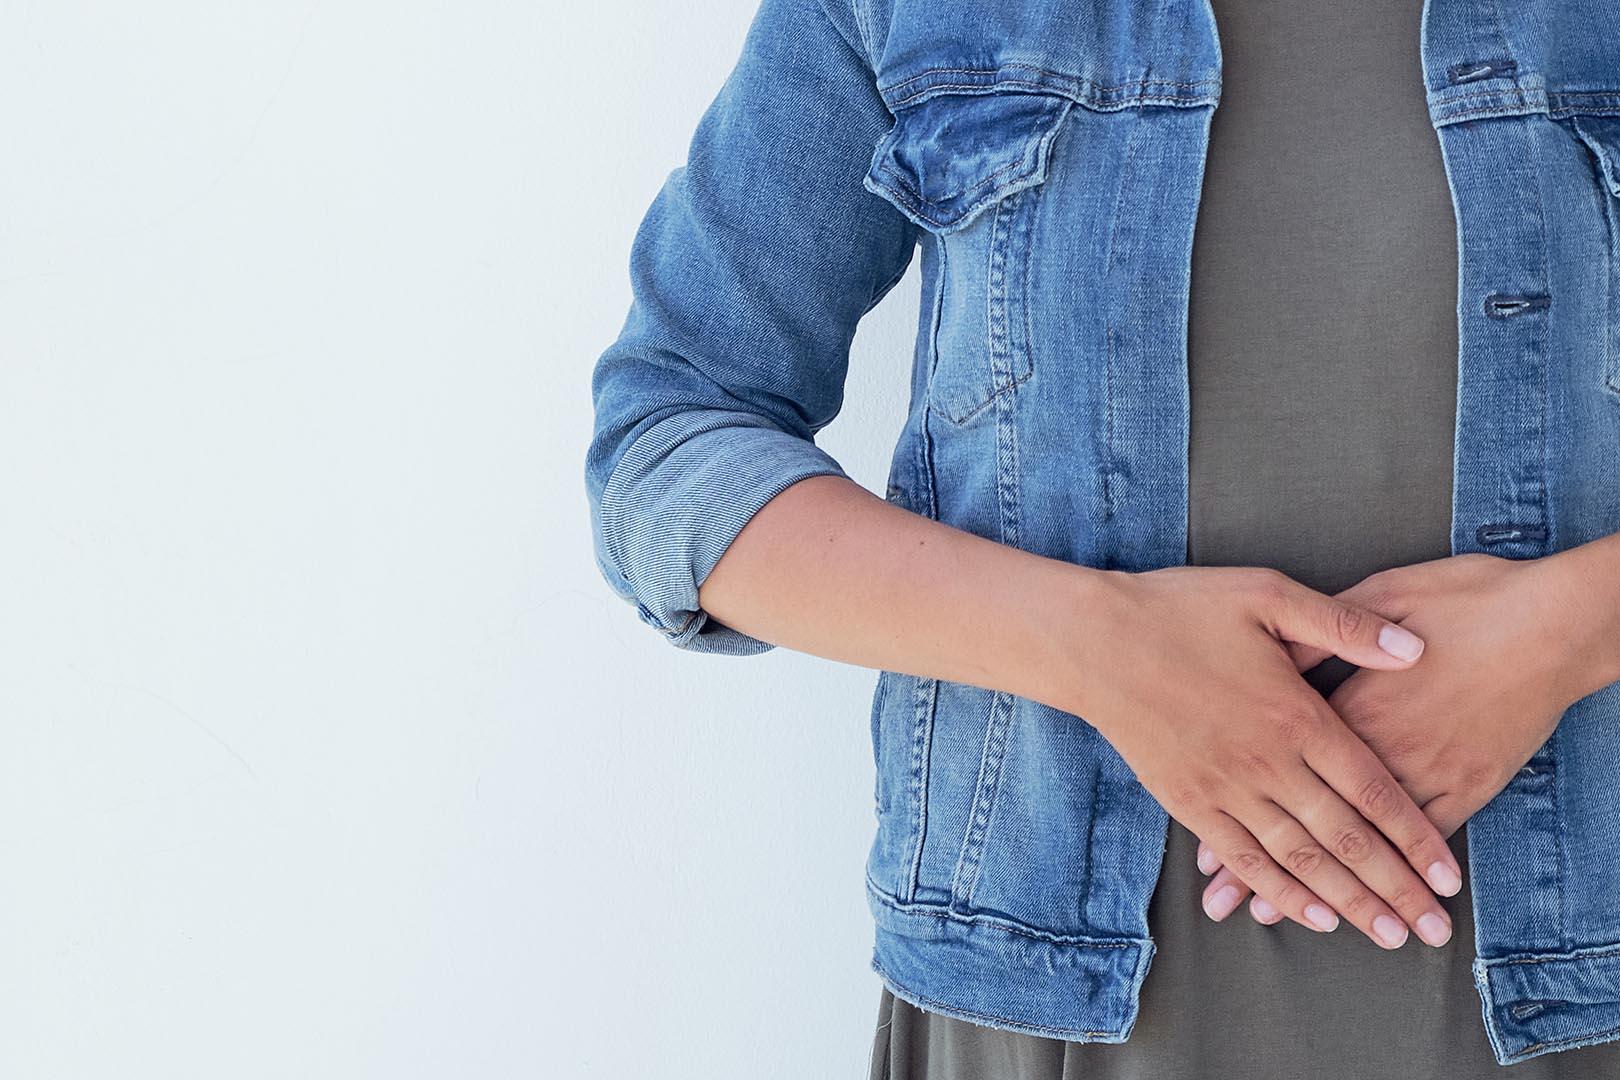 Penyakit Hernia: Ini Penyebab dan Cara Pencegahannya